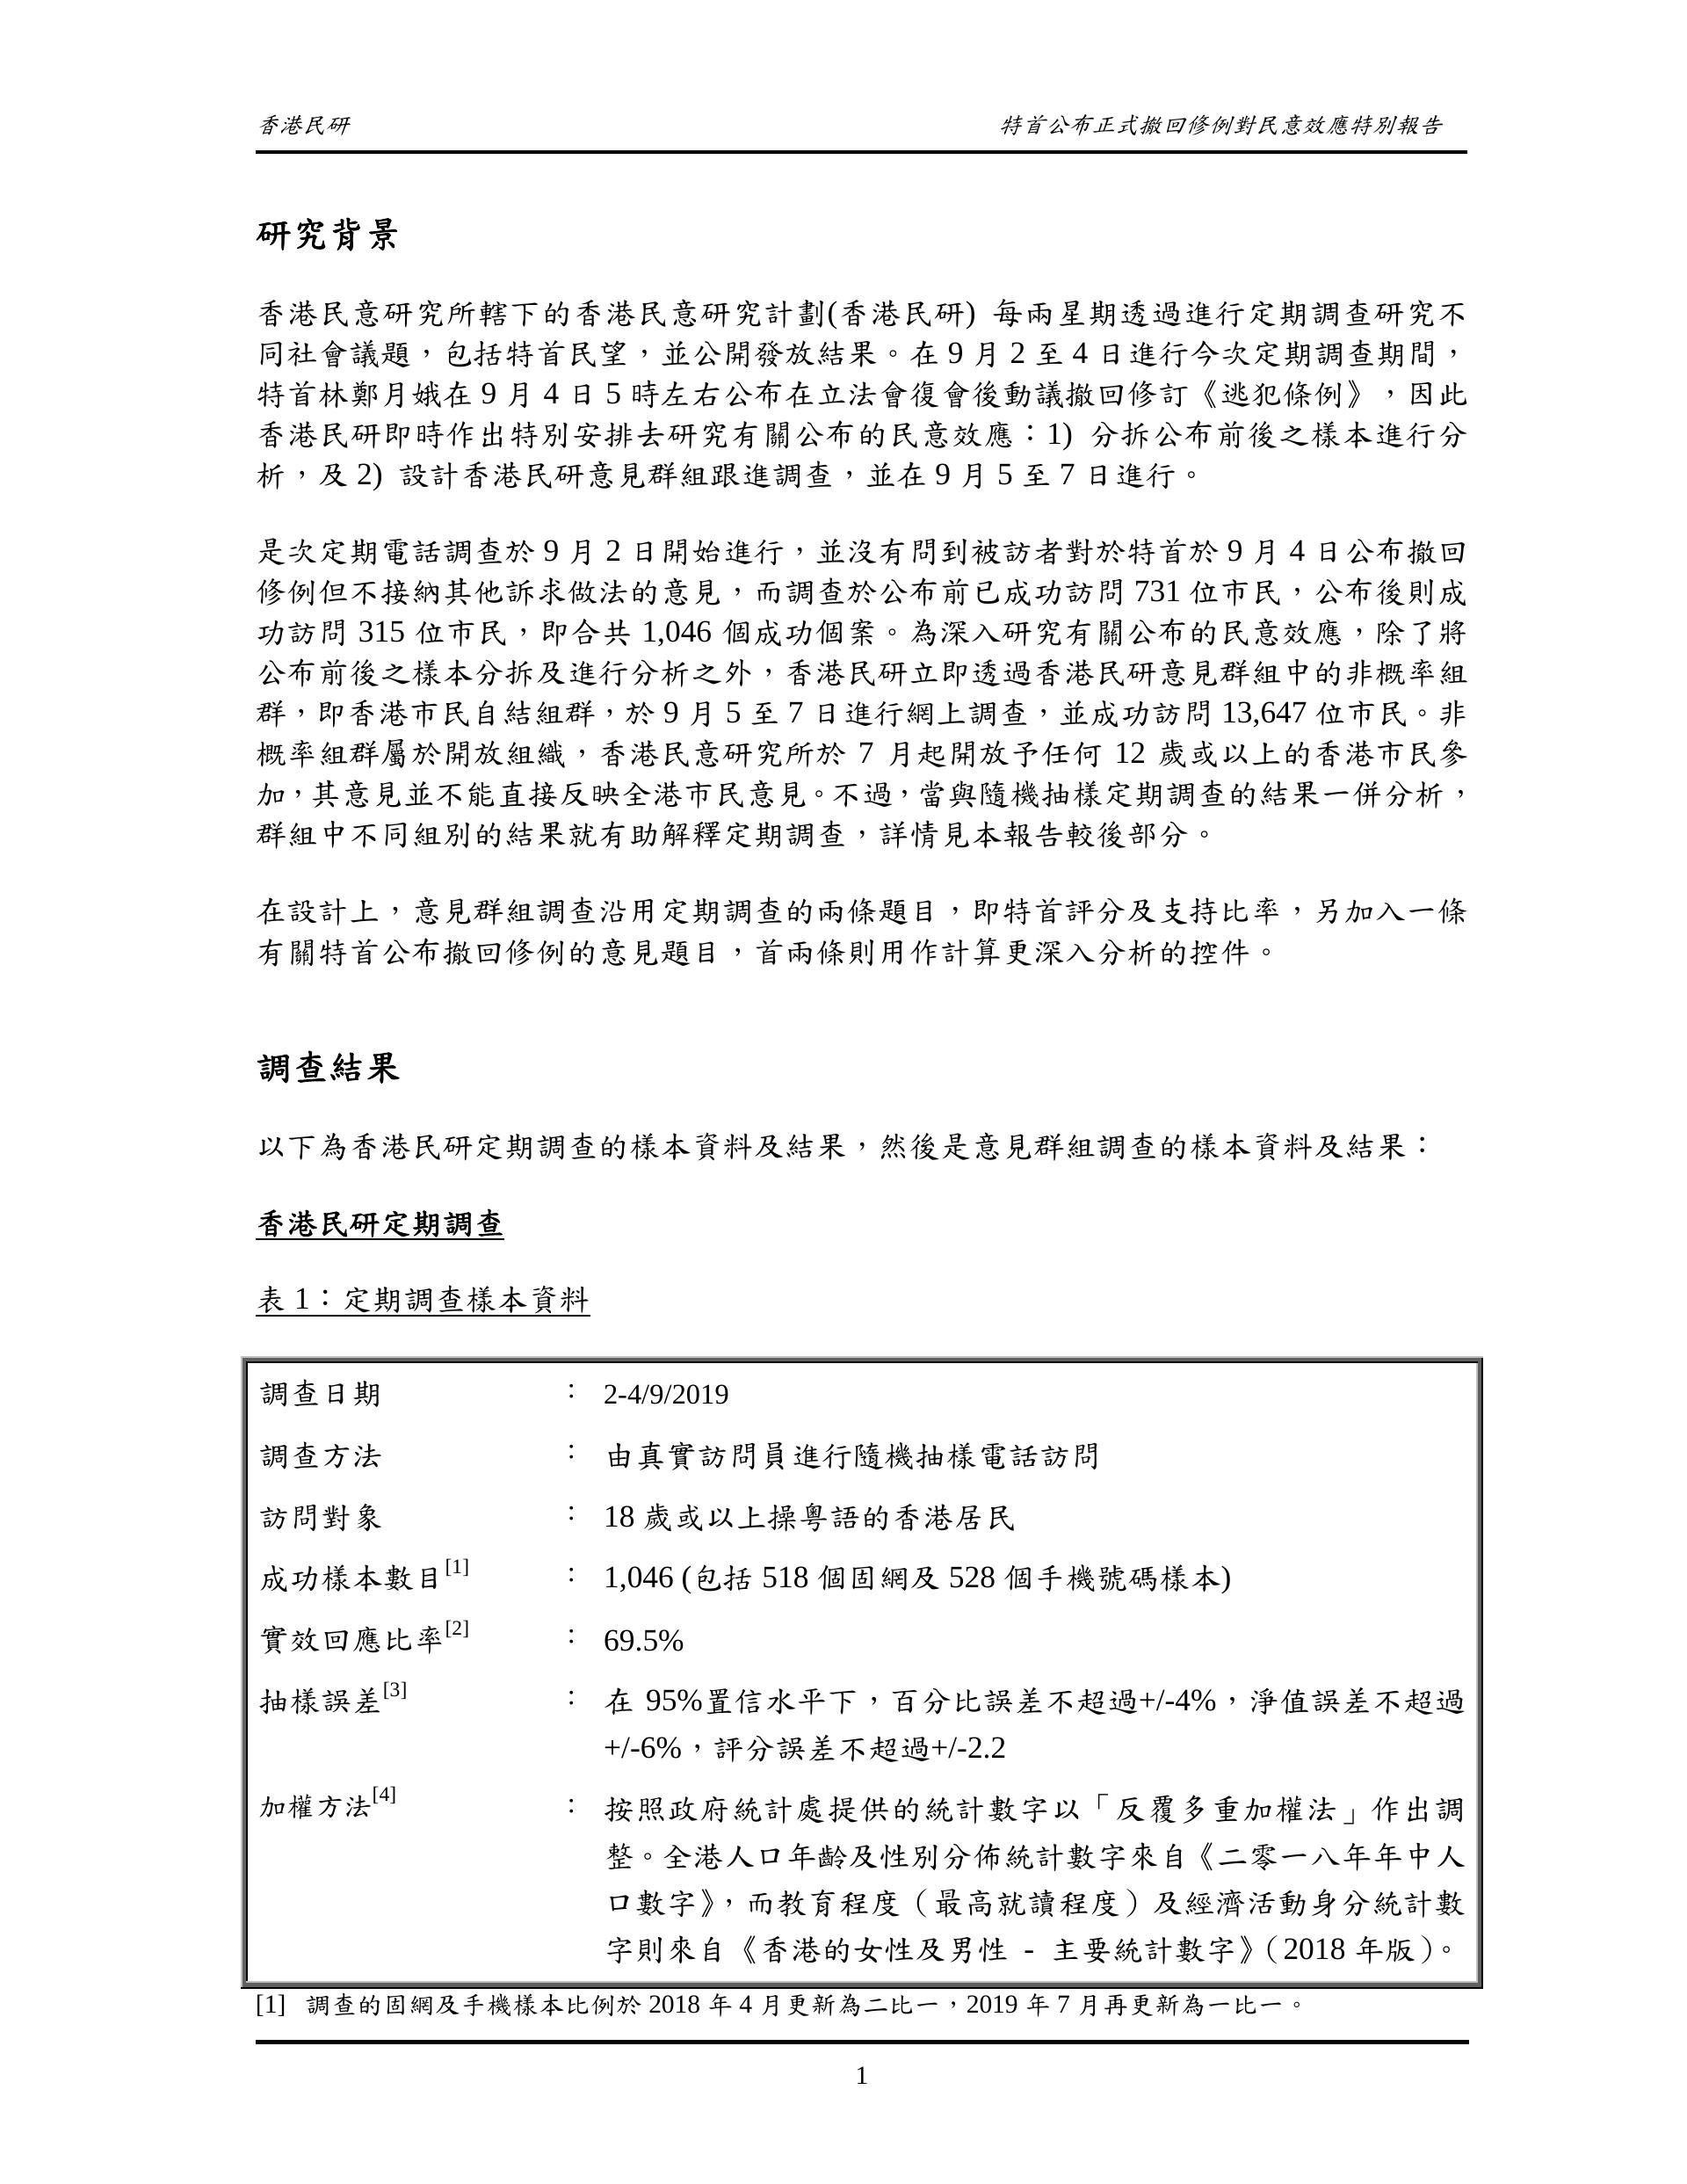 PDFtoJPG.me-2.jpg